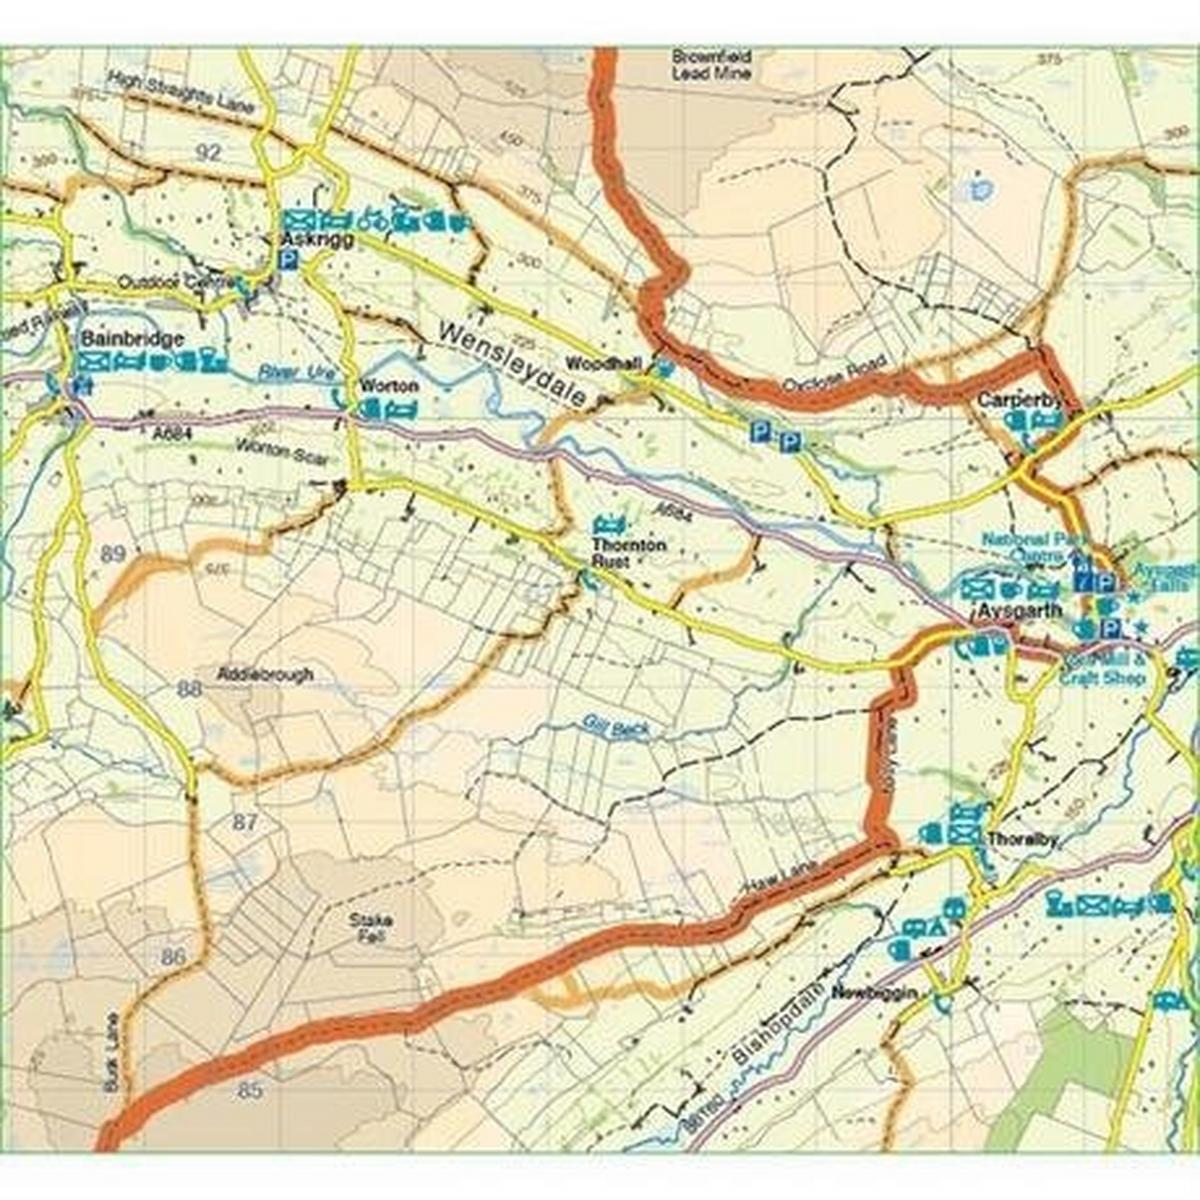 Harveys Harvey Map - XT60: Coast to Coast - West - for Mountain Bikers and Cyclists